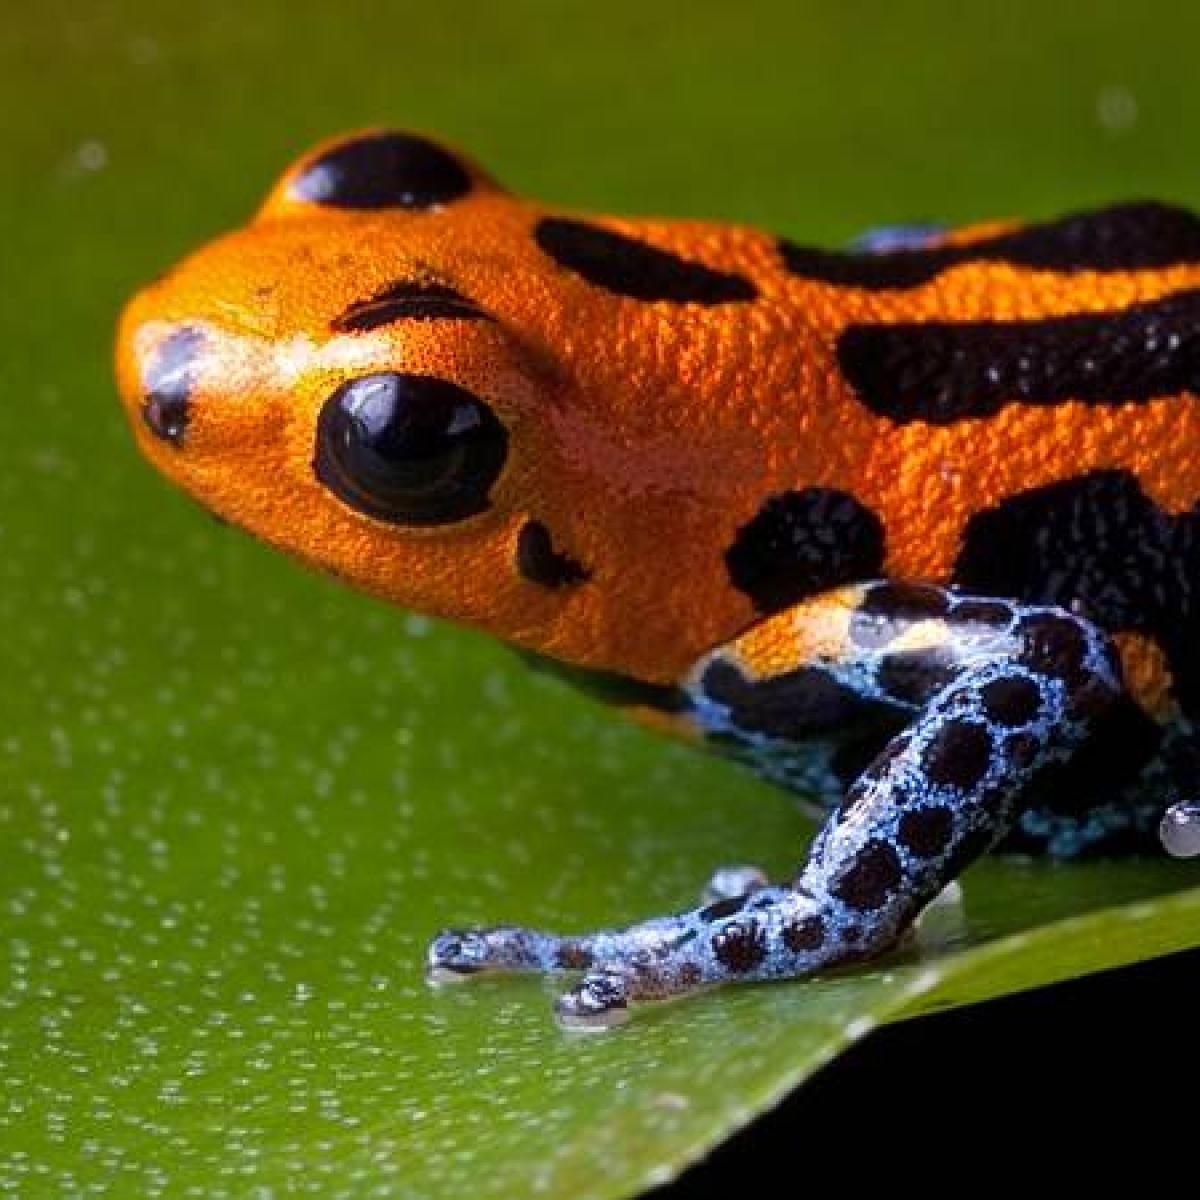 May be, it's world's biggest amphibian